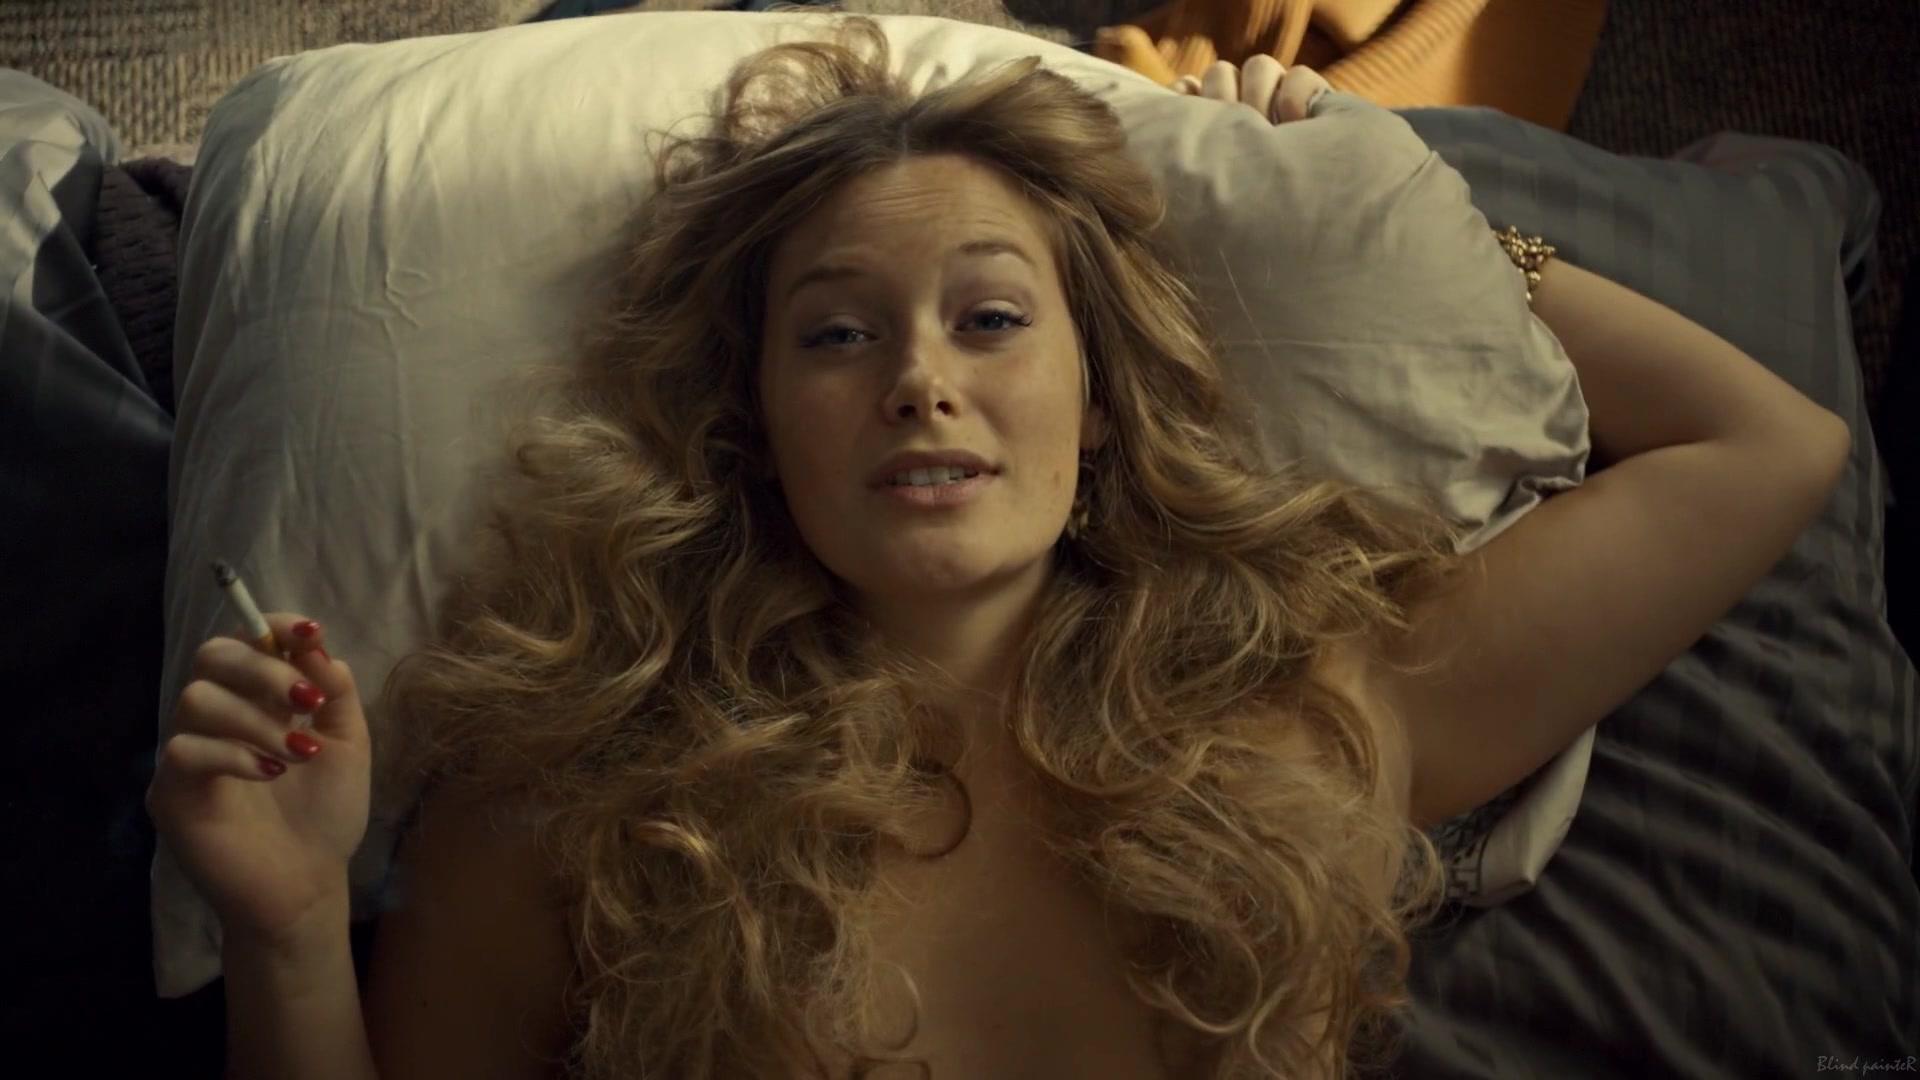 Shannyn sossamon sexy nude video free download